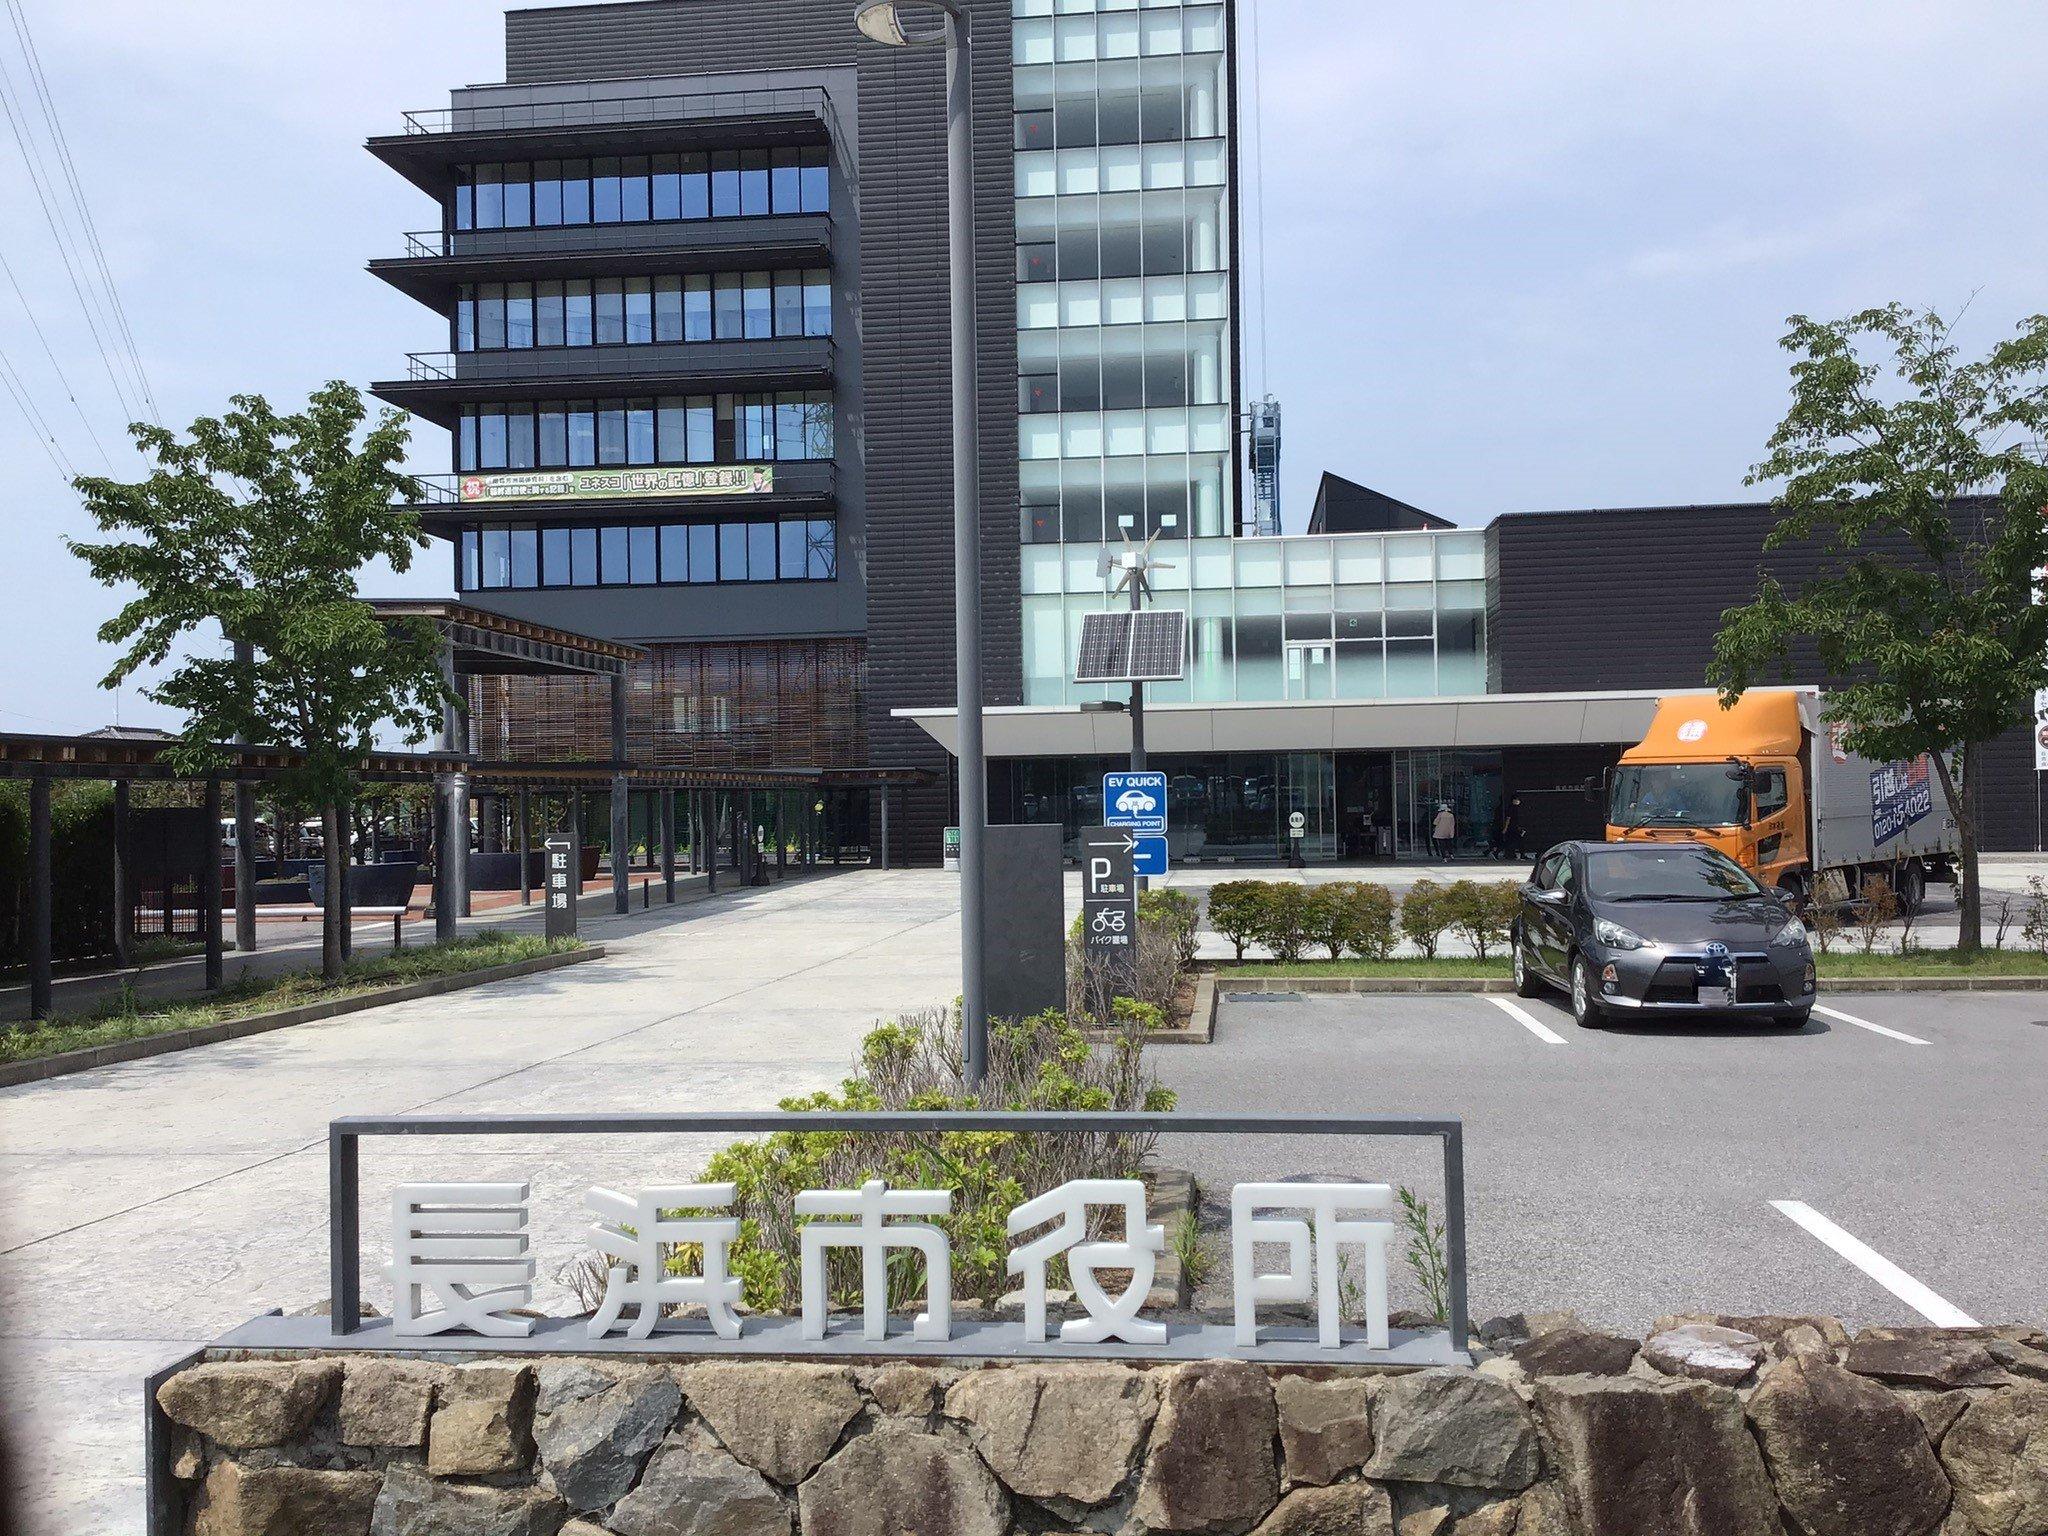 CUsershiroshi_katsumiDocuments備忘録HubSpot画像iot_sensor長浜市役所